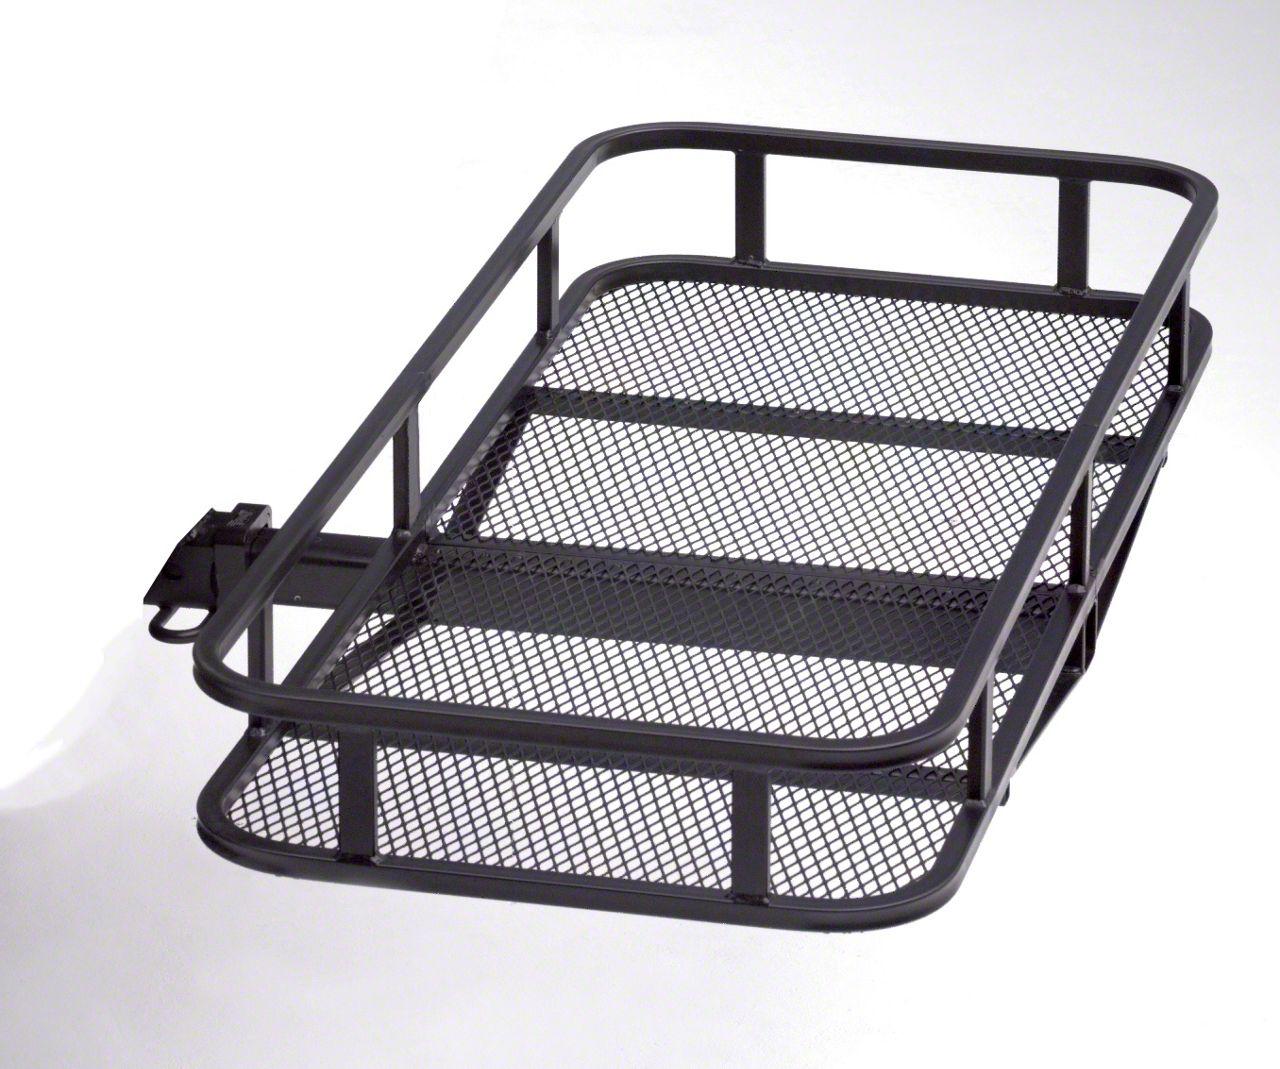 Surco Hauler Hitch Basket - 24 in. x 60 in. (97-19 F-150)